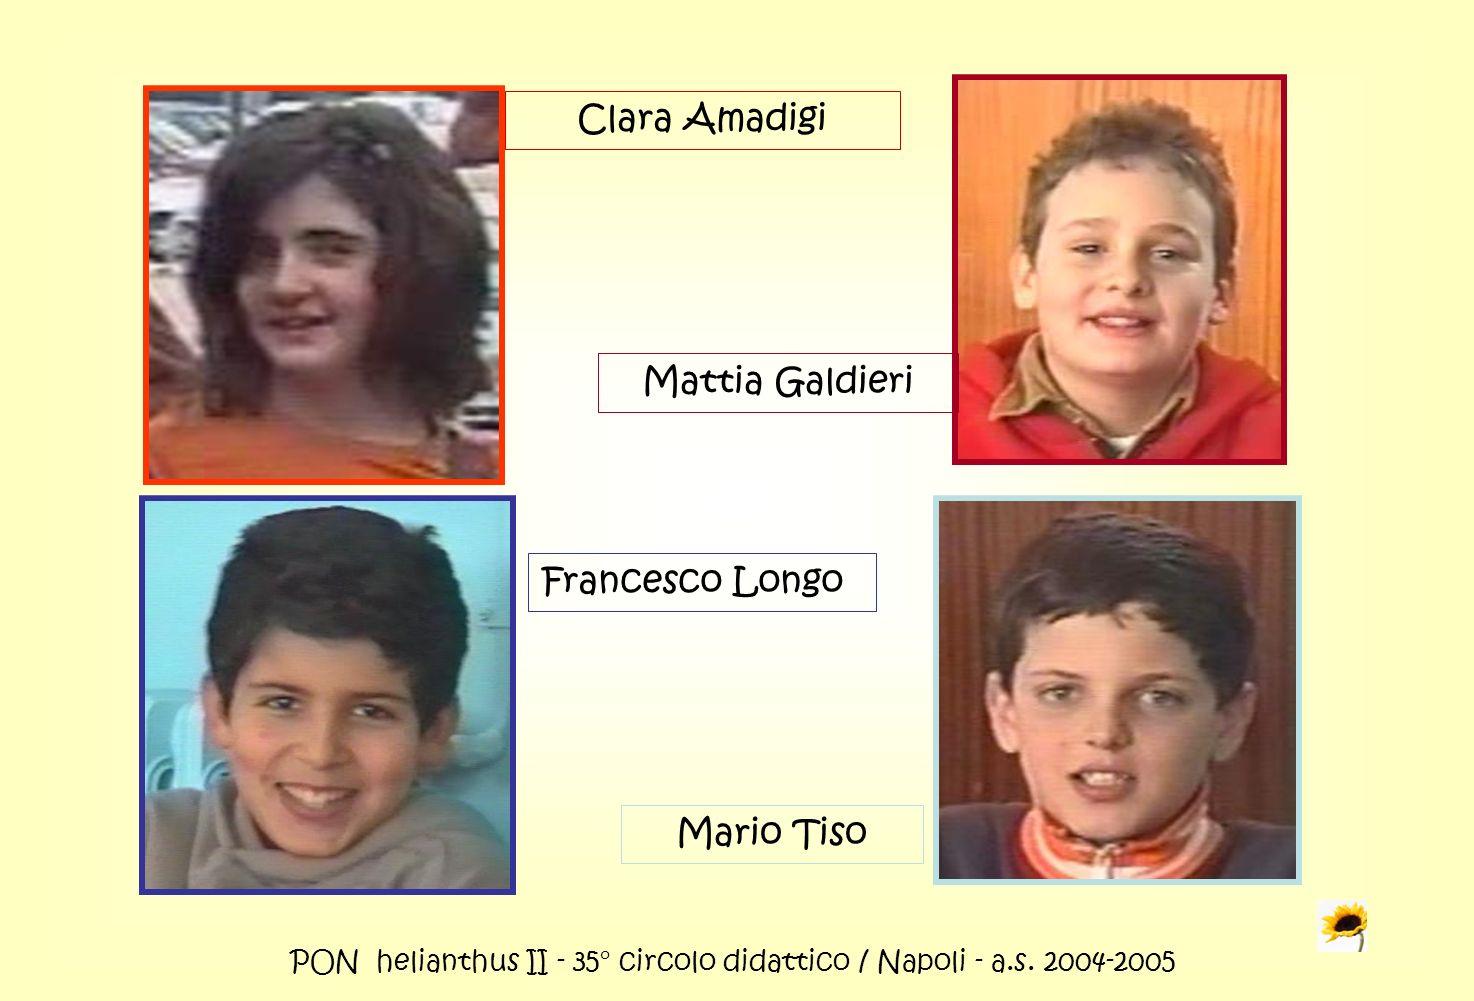 PON helianthus II - 35° circolo didattico / Napoli - a.s. 2004-2005 Clara Amadigi Mattia Galdieri Francesco Longo Mario Tiso